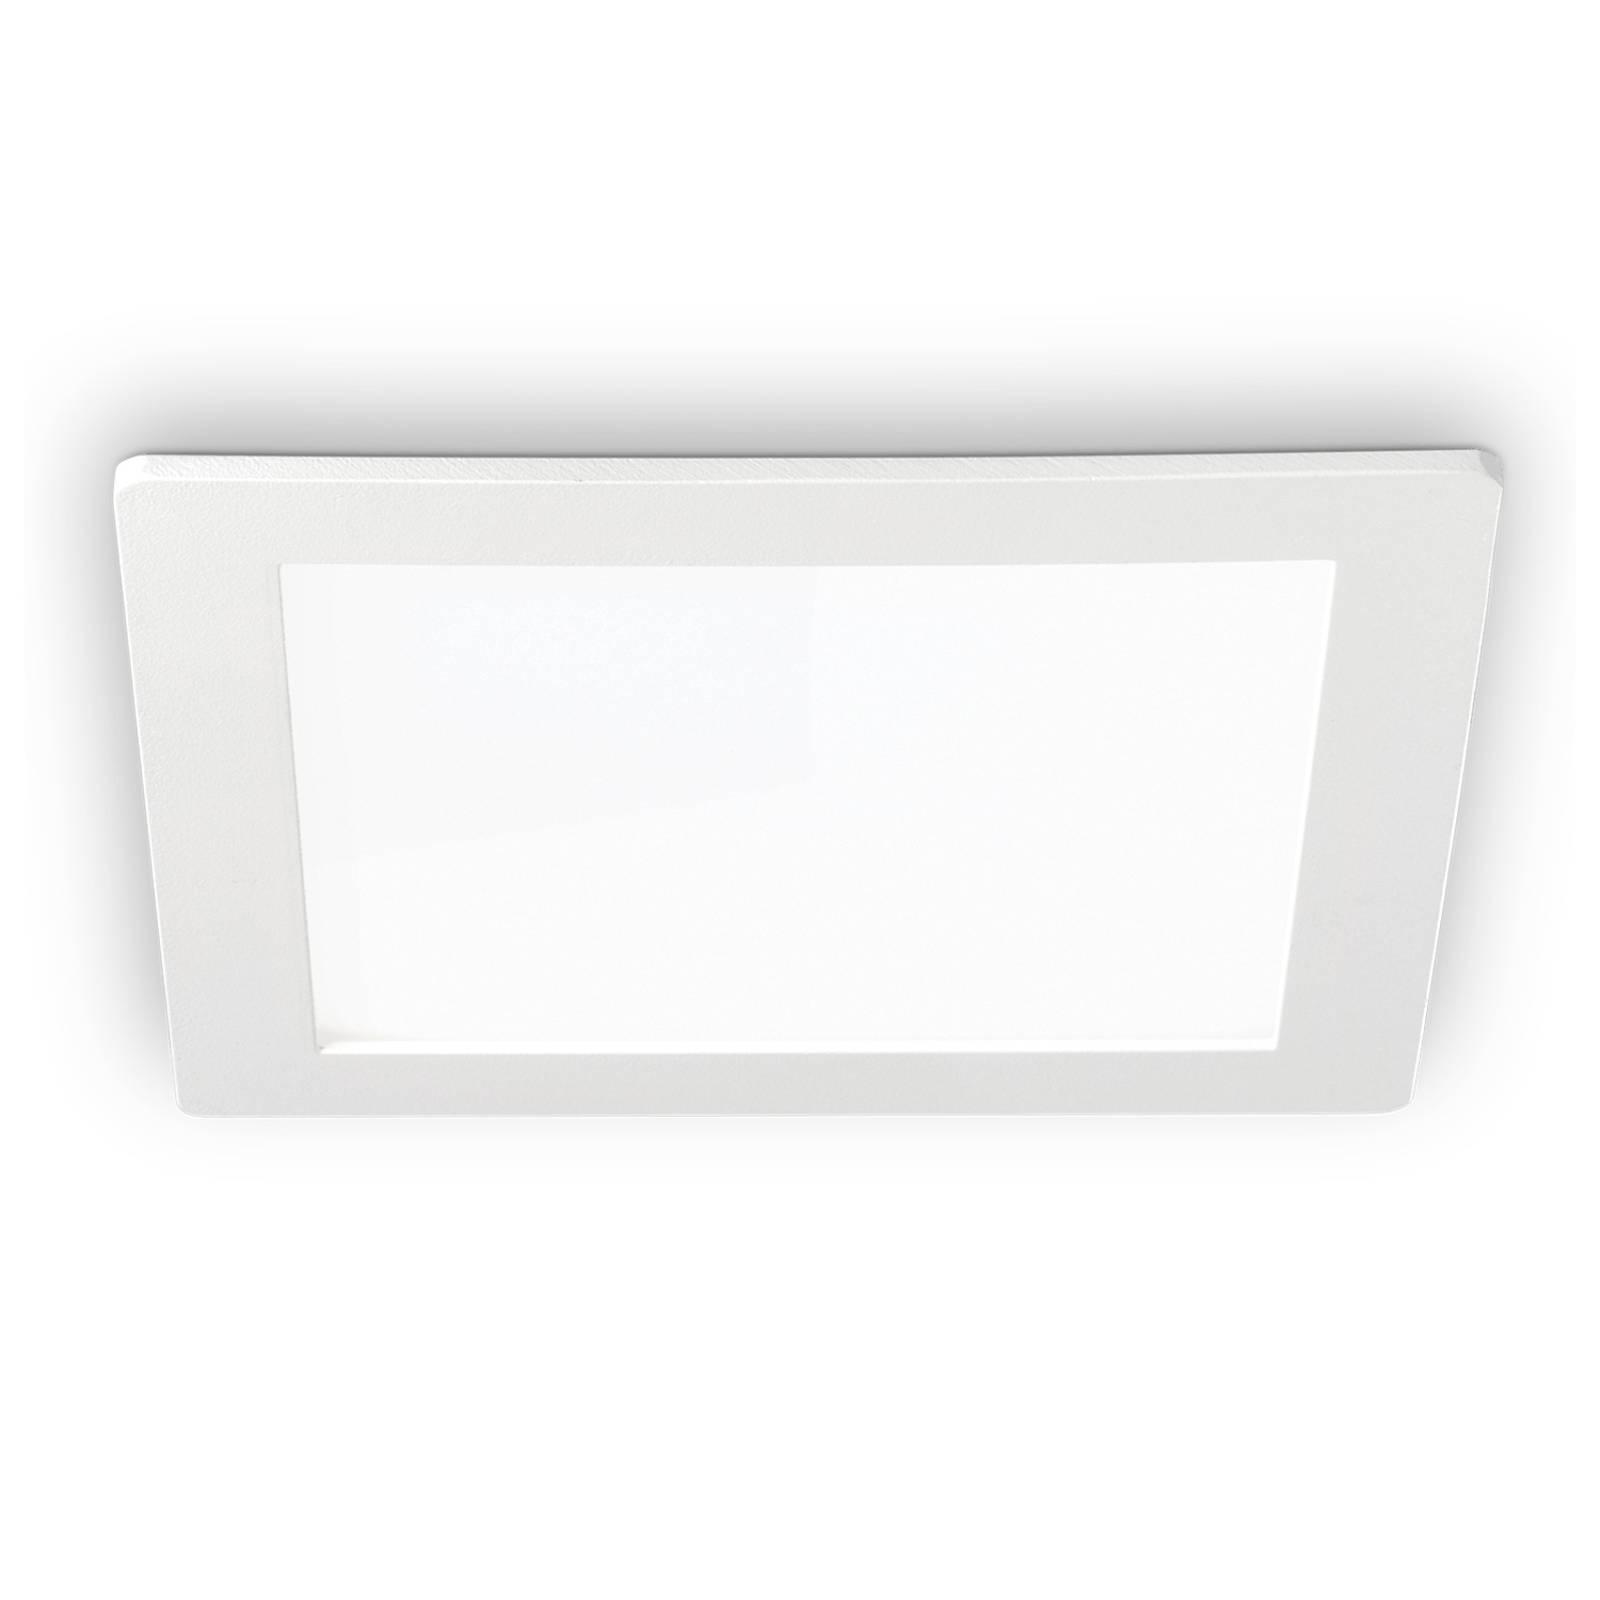 Lampa sufitowa LED Groove square 22,7x22,7 cm